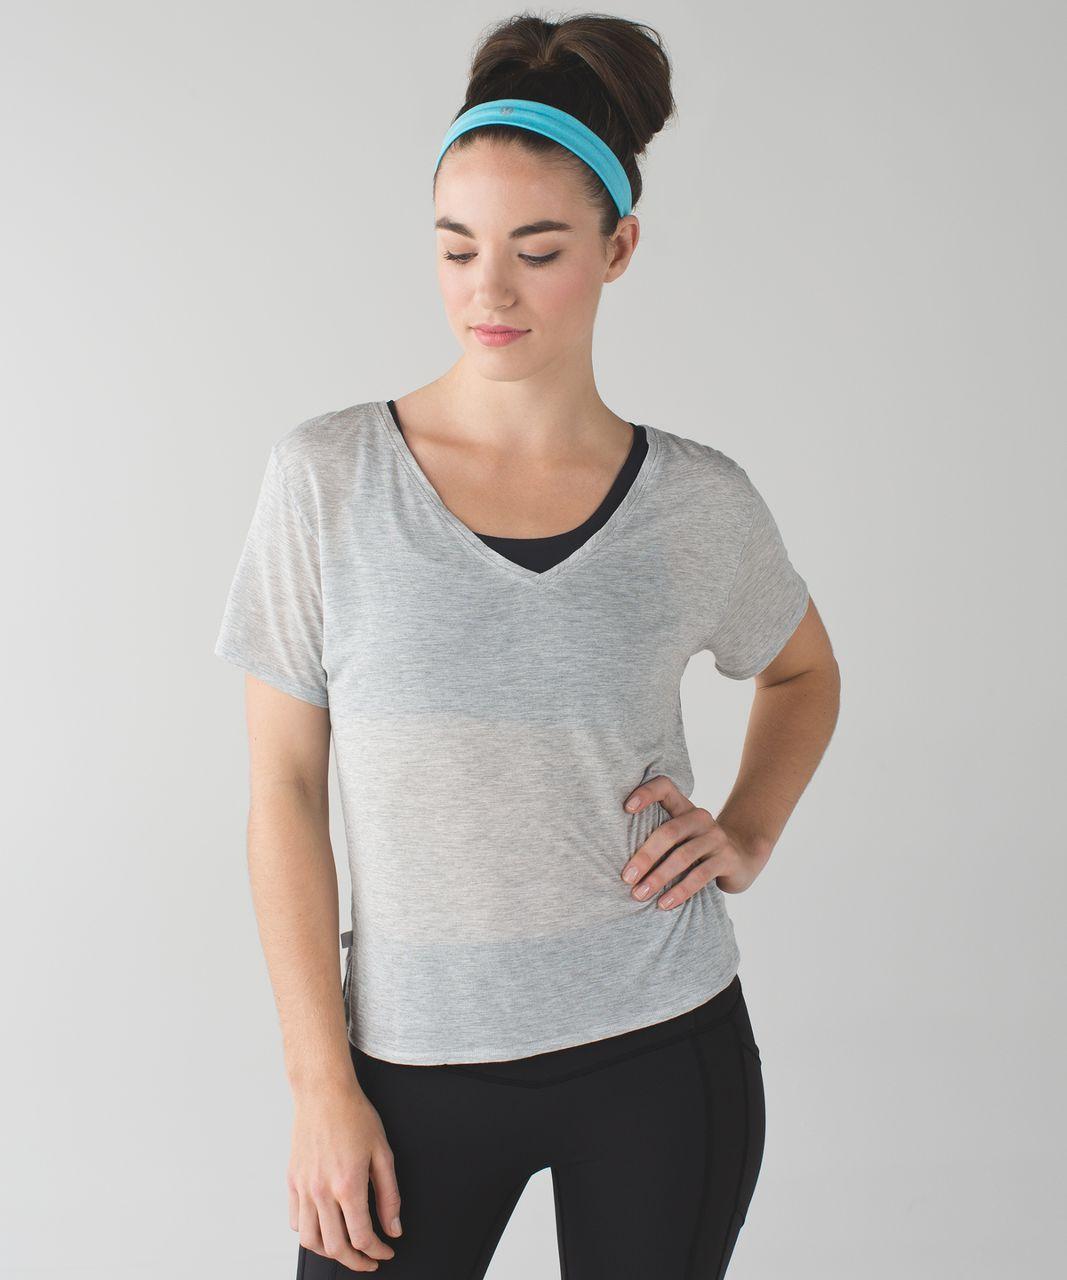 Lululemon Cardio Cross Trainer Headband - Heathered Fresco Blue